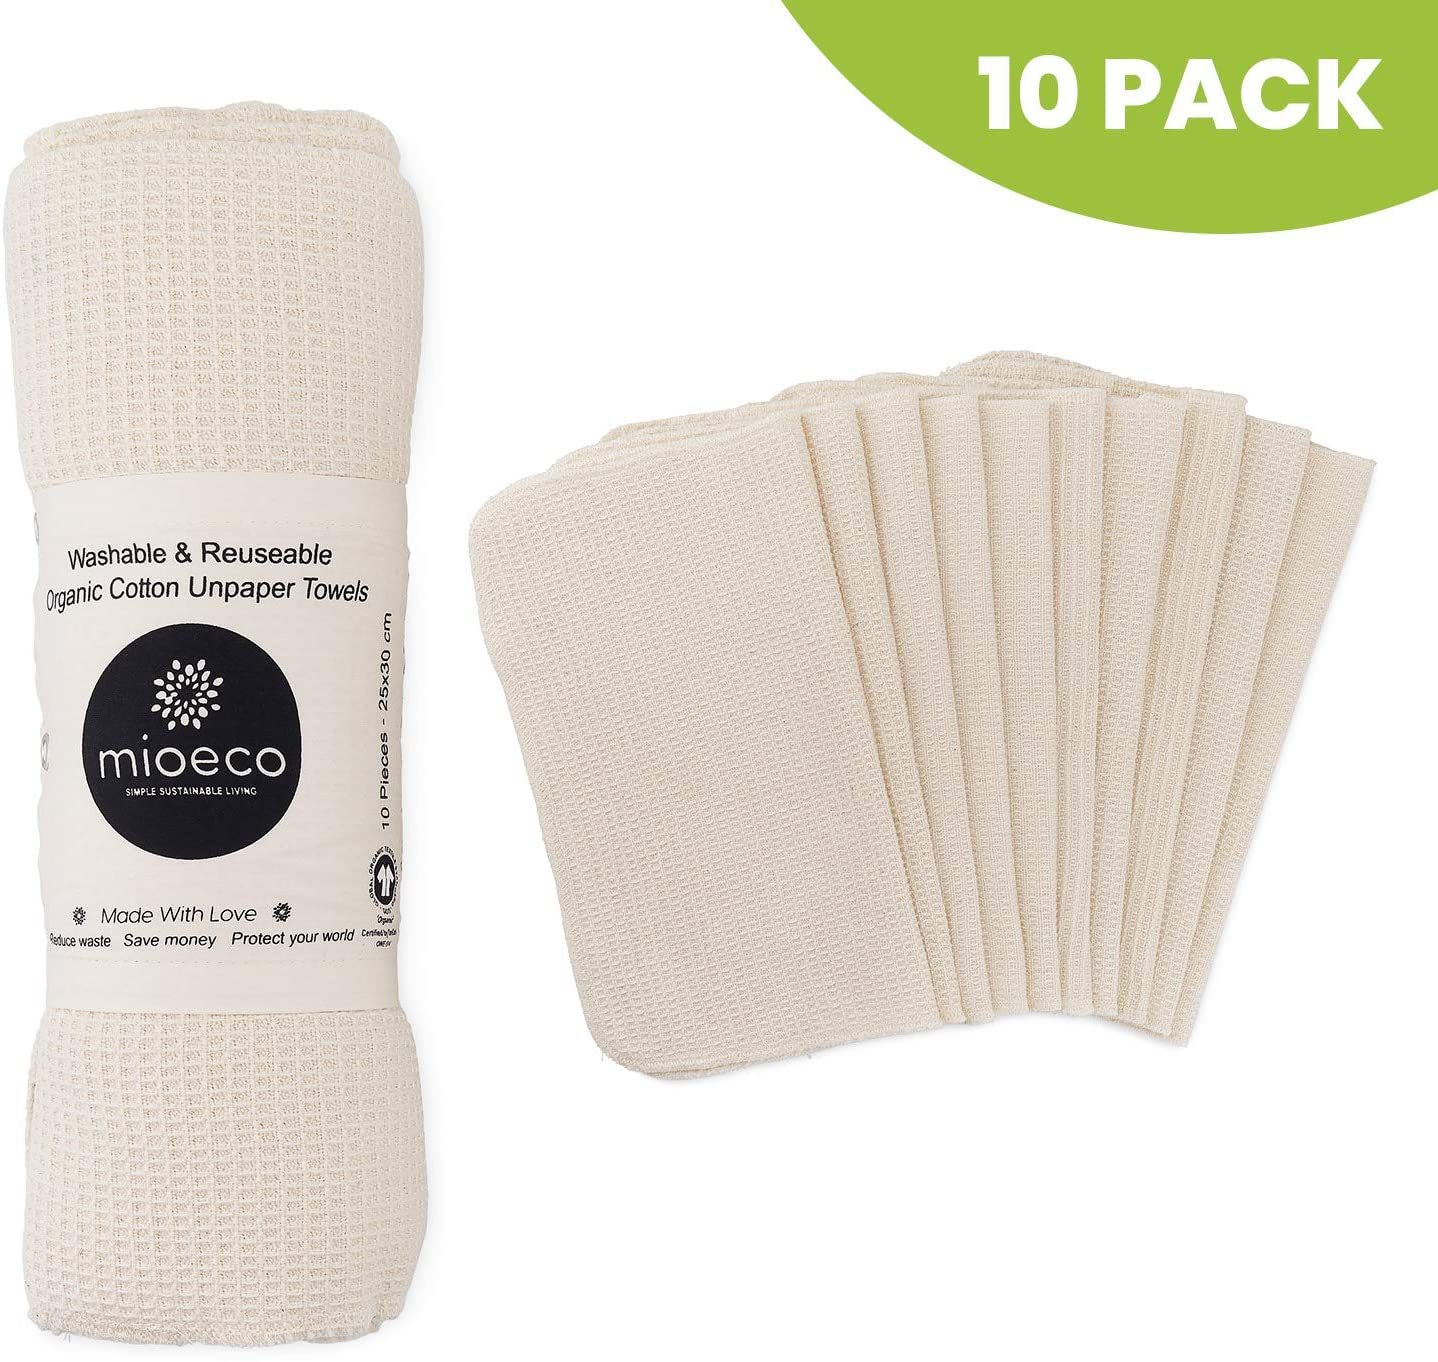 Mioeco Reusable Unpaper Towels Washable - Bamboo Nature Friendly Paper Towels Organic Cotton